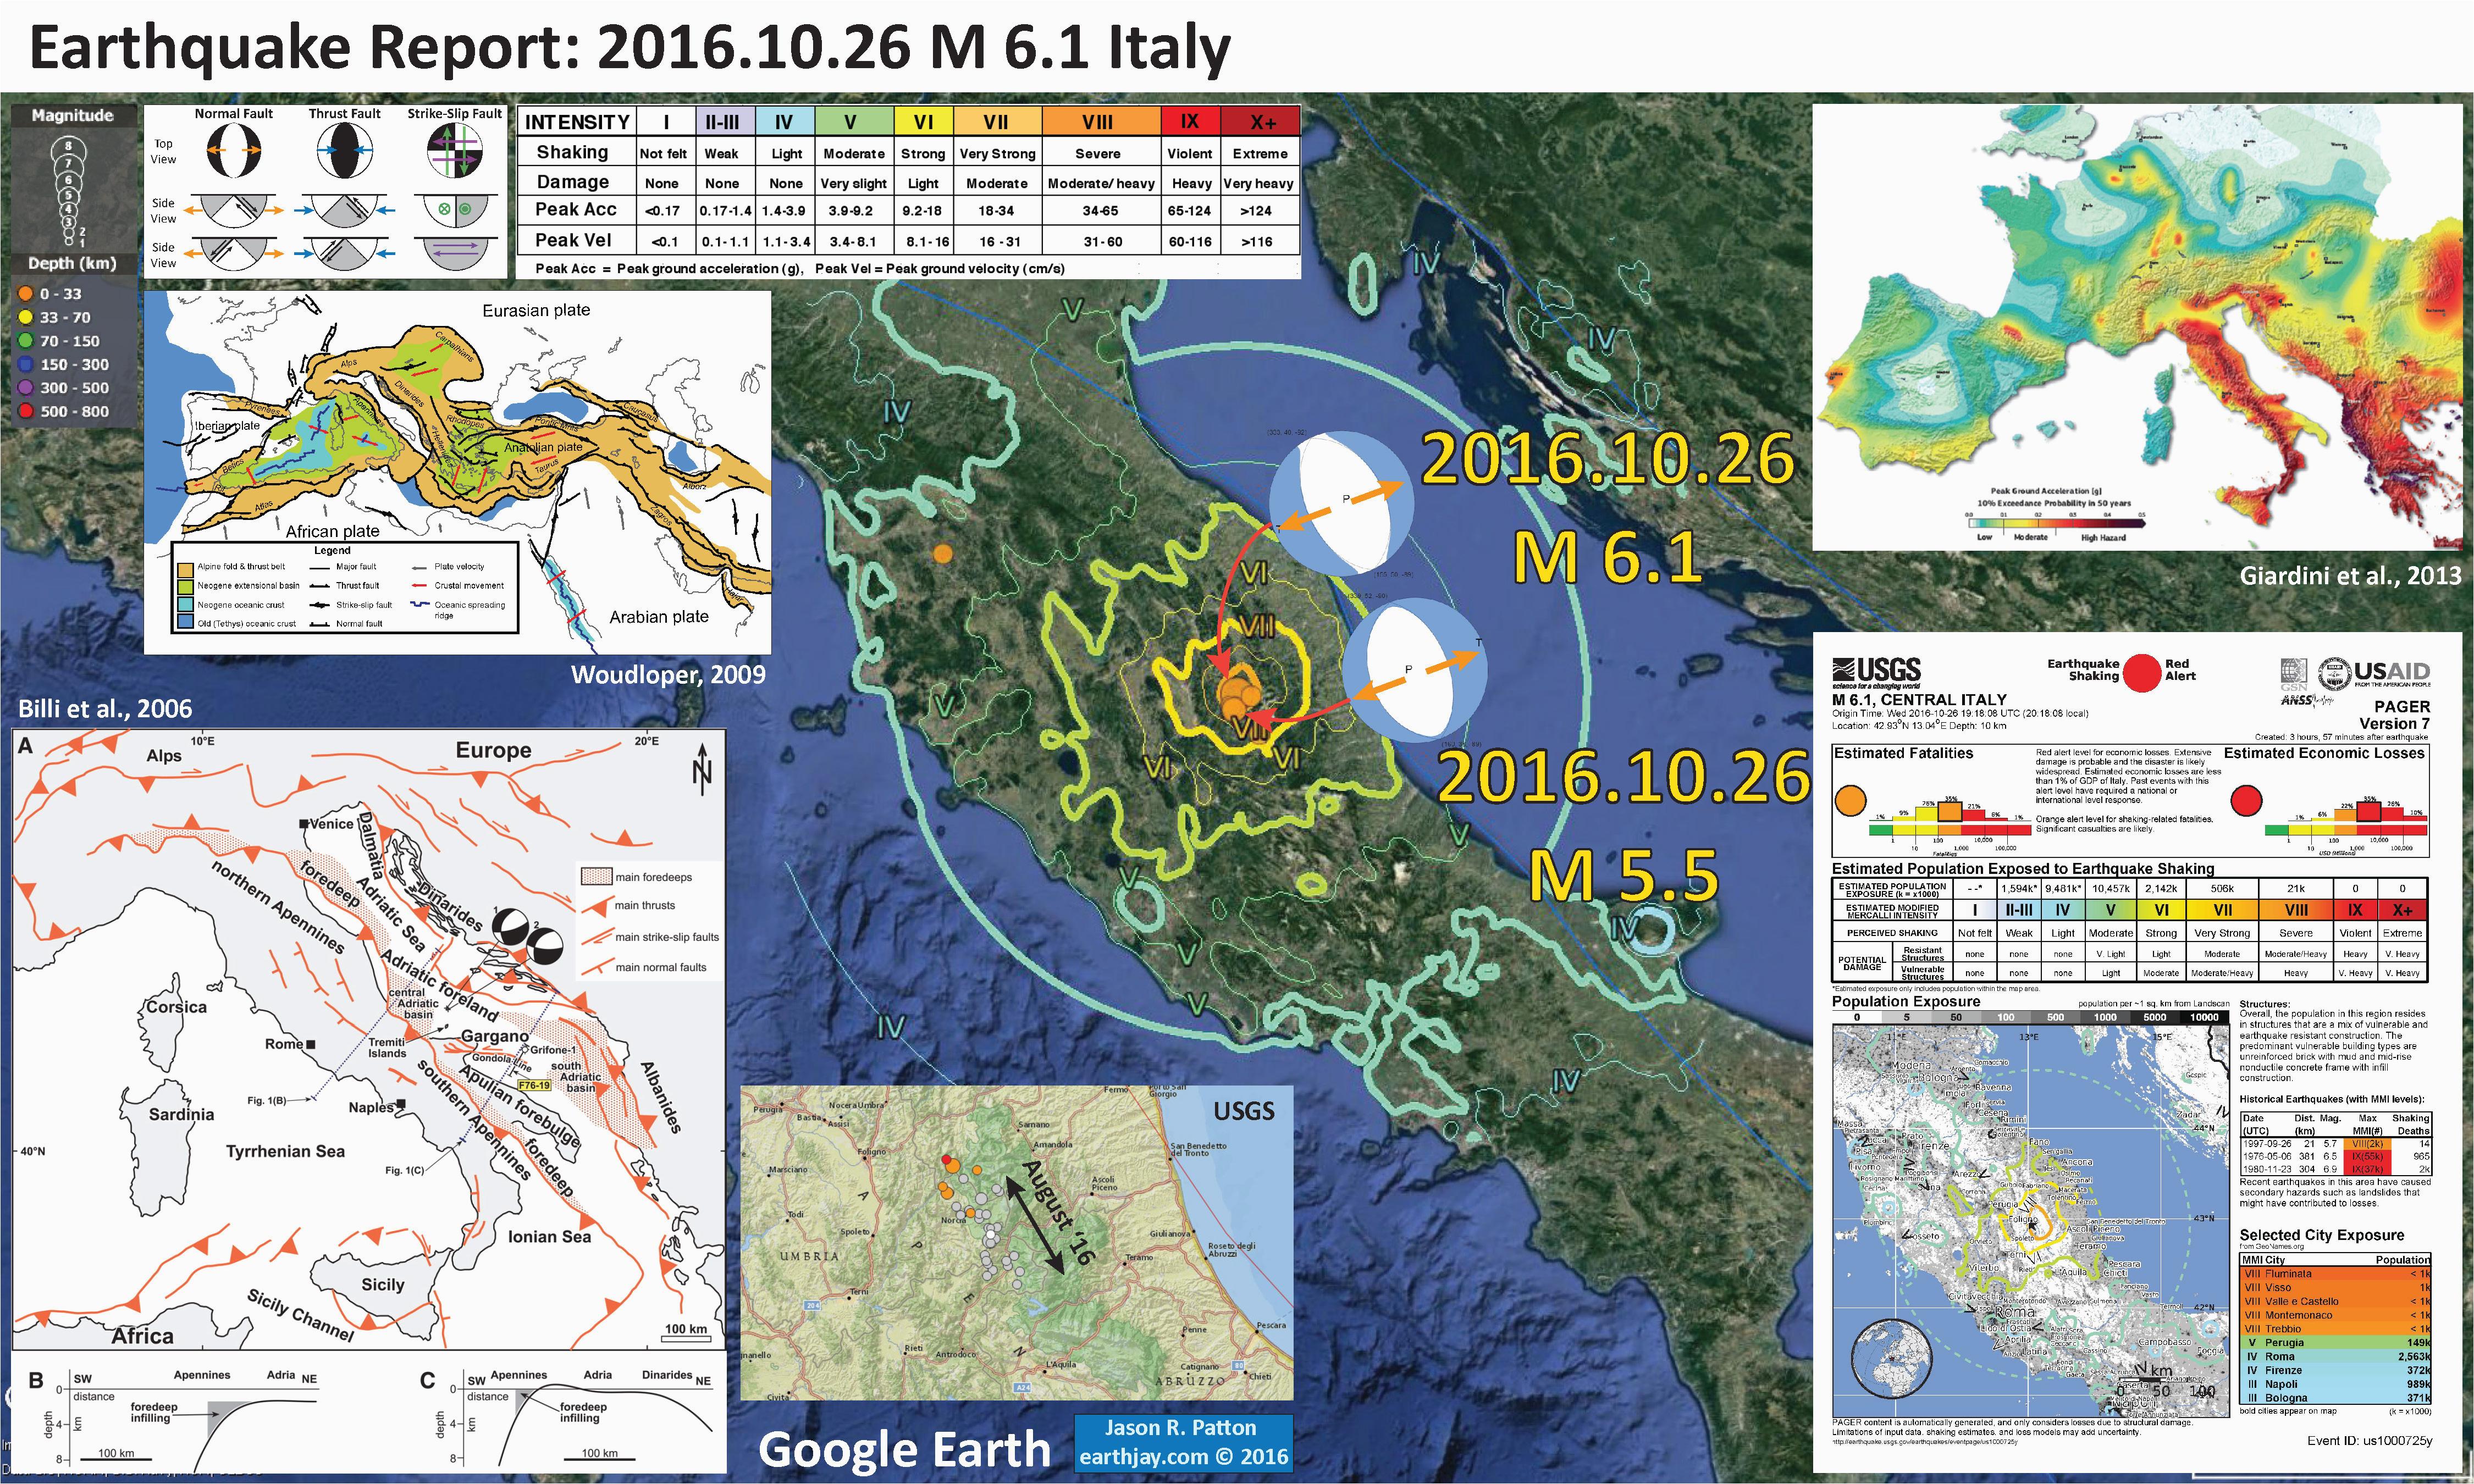 California Earthquake Map Live Live Earthquake Map California Best Of Map Earthquakes Around the